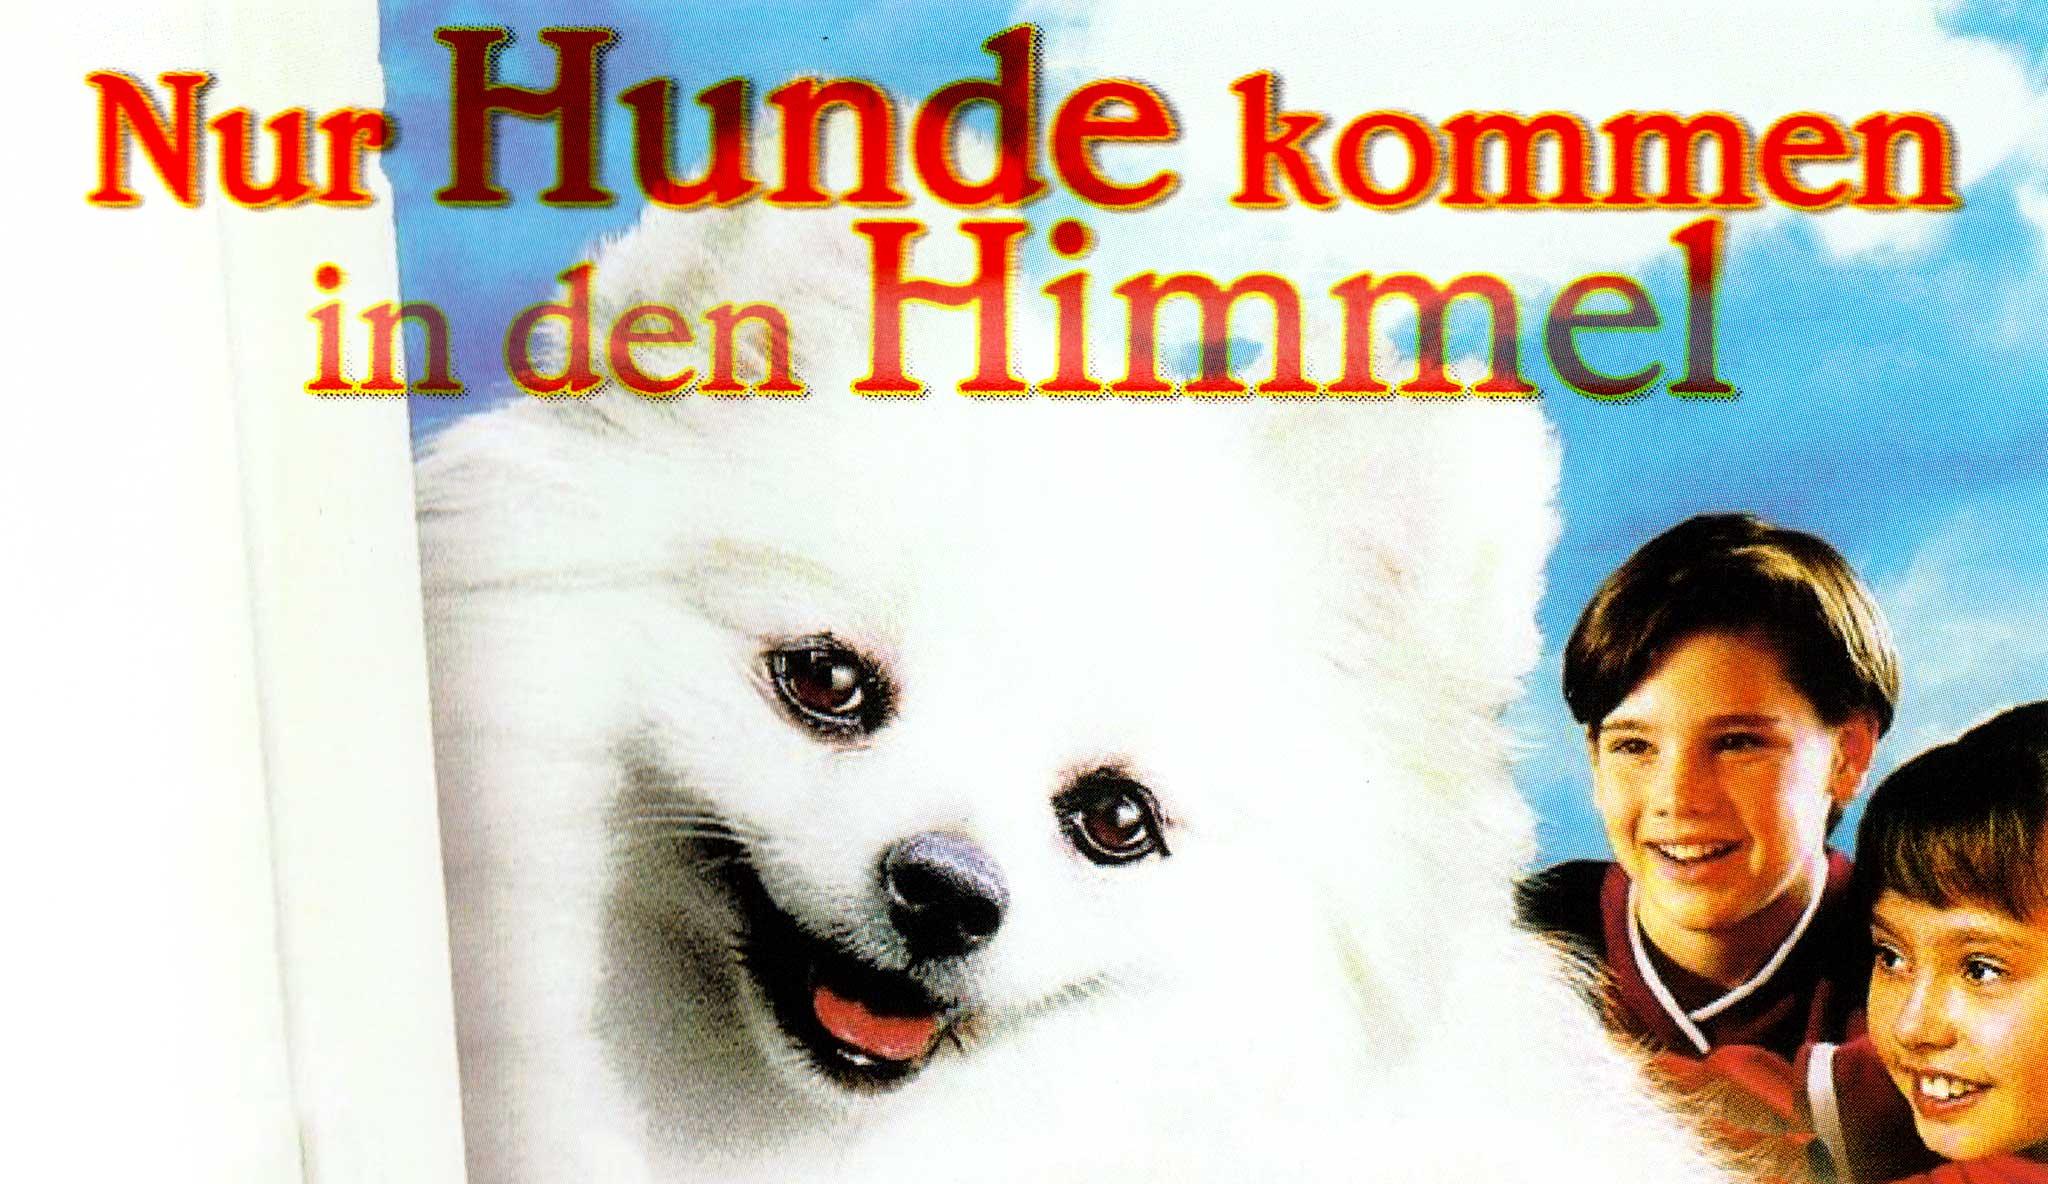 nur-hunde-kommen-in-den-himmel\header.jpg